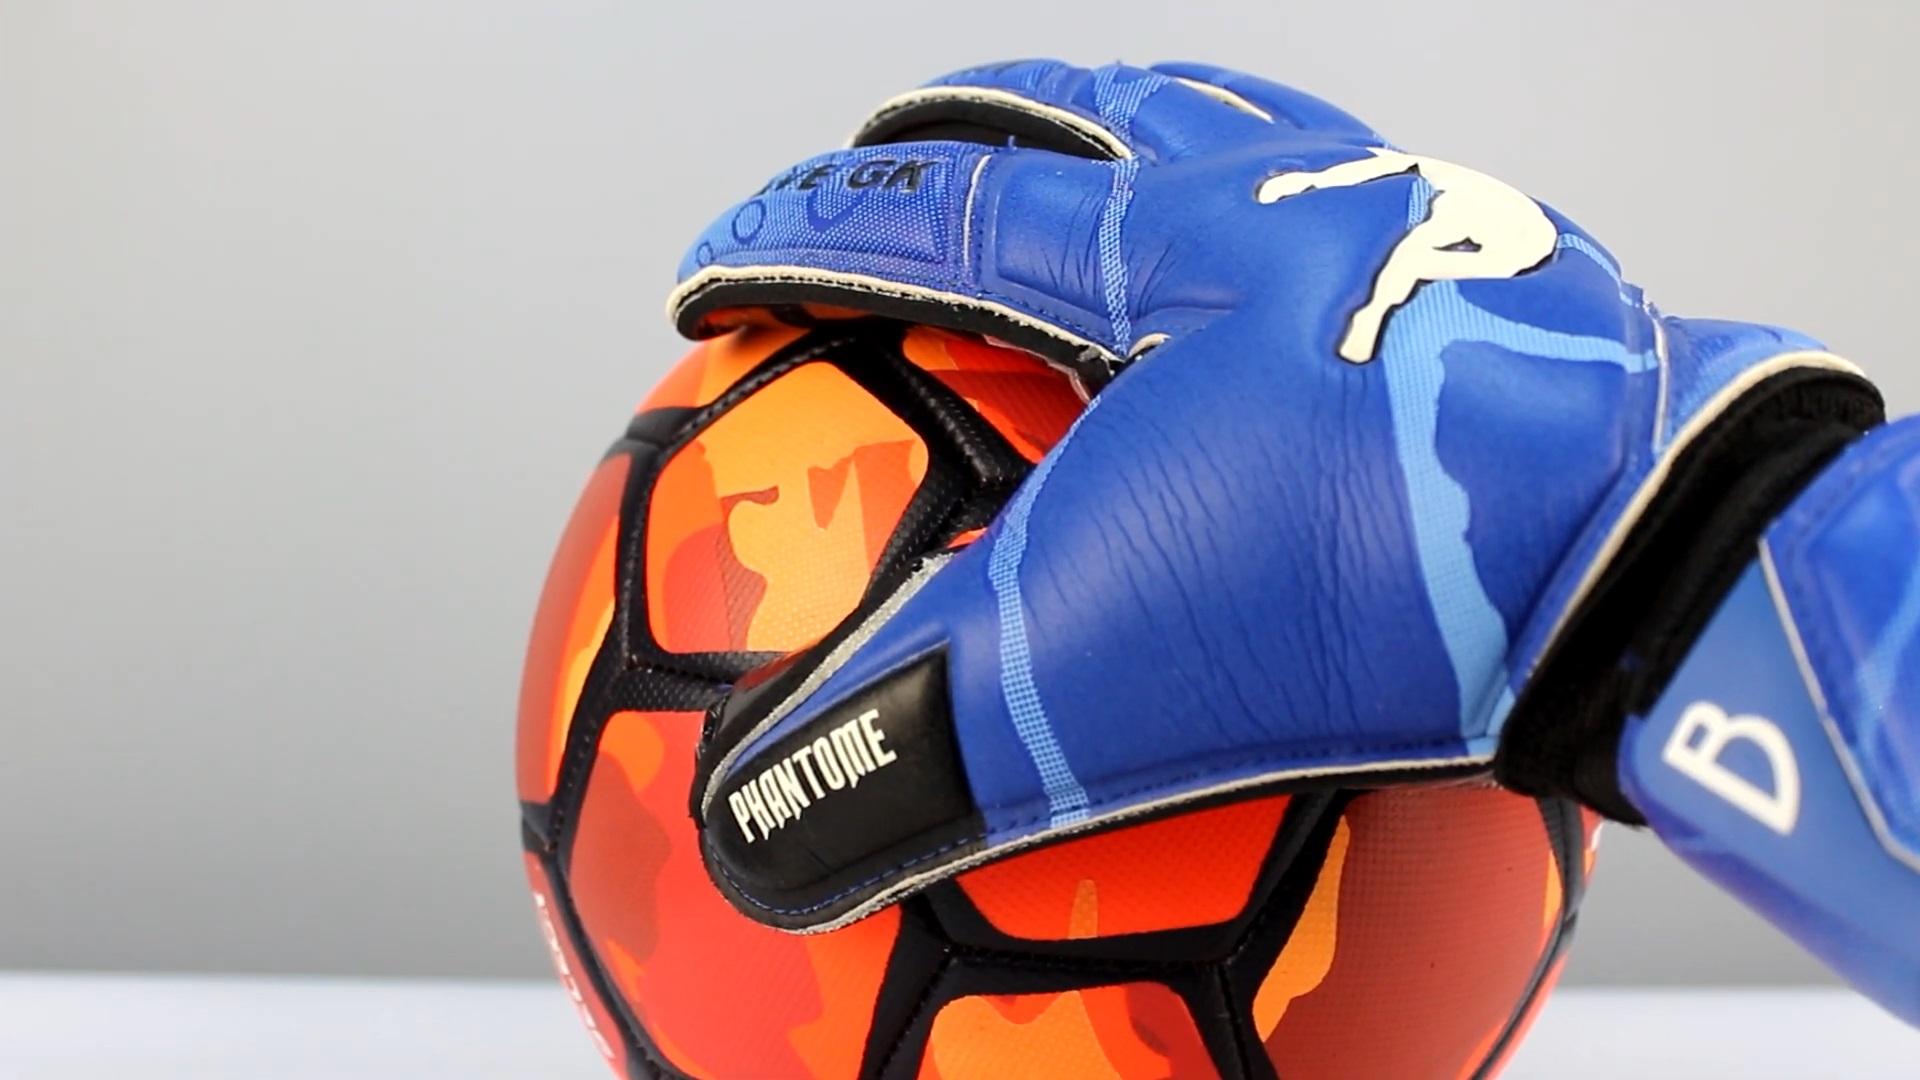 Воротарські рукавиці Brave GK Phantome-офіційний інтернет-магазин Brave GK